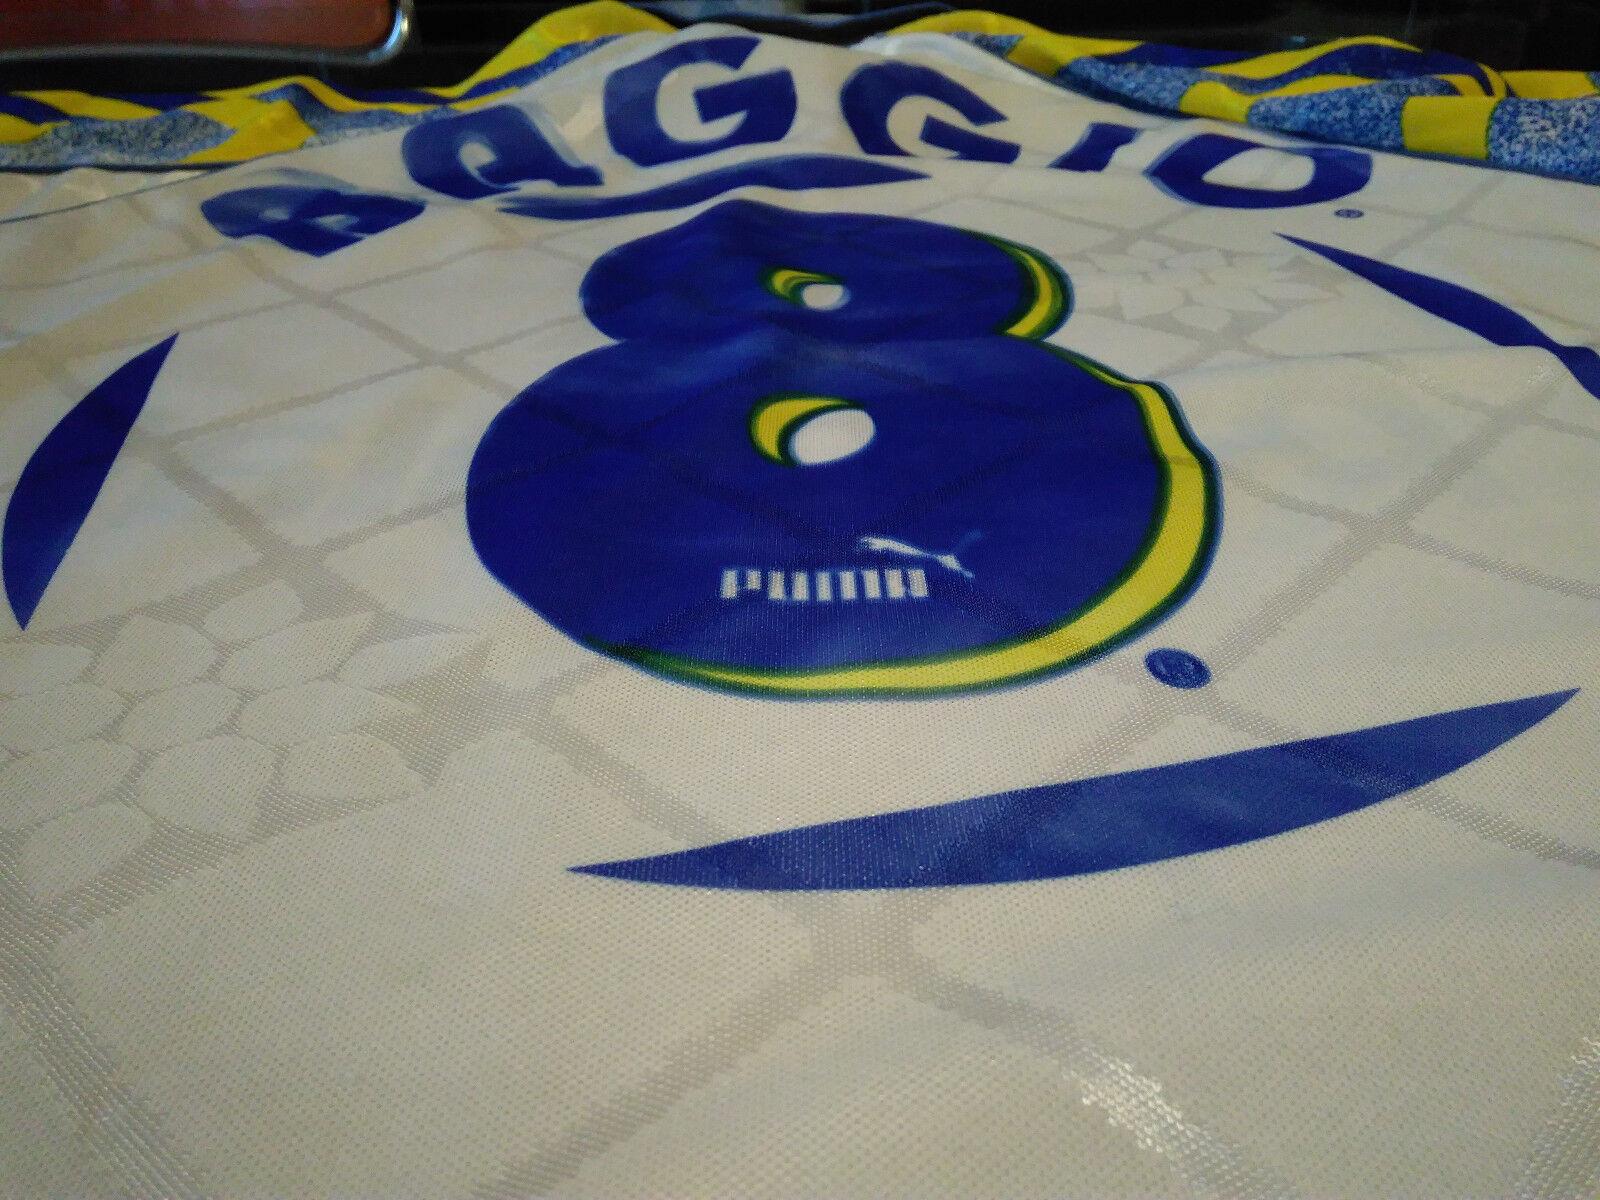 Dino Baggio  8 Parma Maglia Shirt Trikot Maillot 1996-97 Lazio Inter Juventus